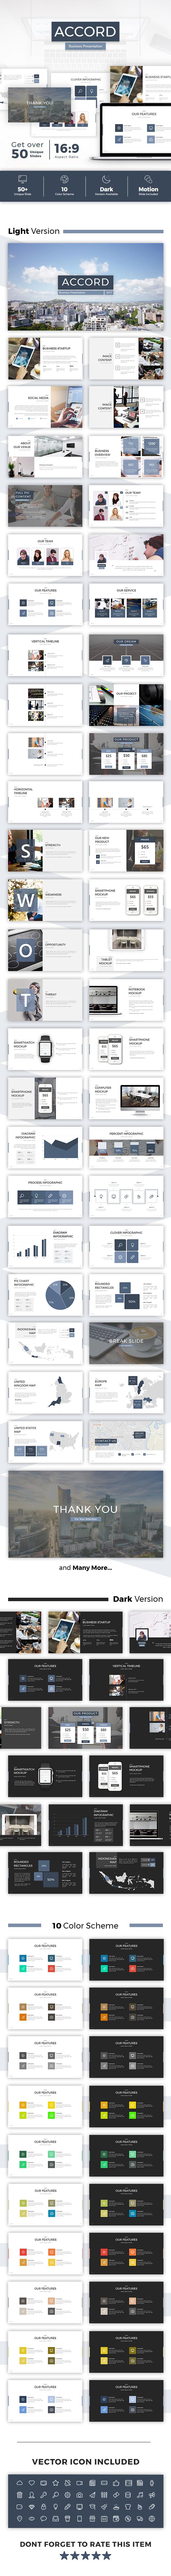 Accord - Business Presentation